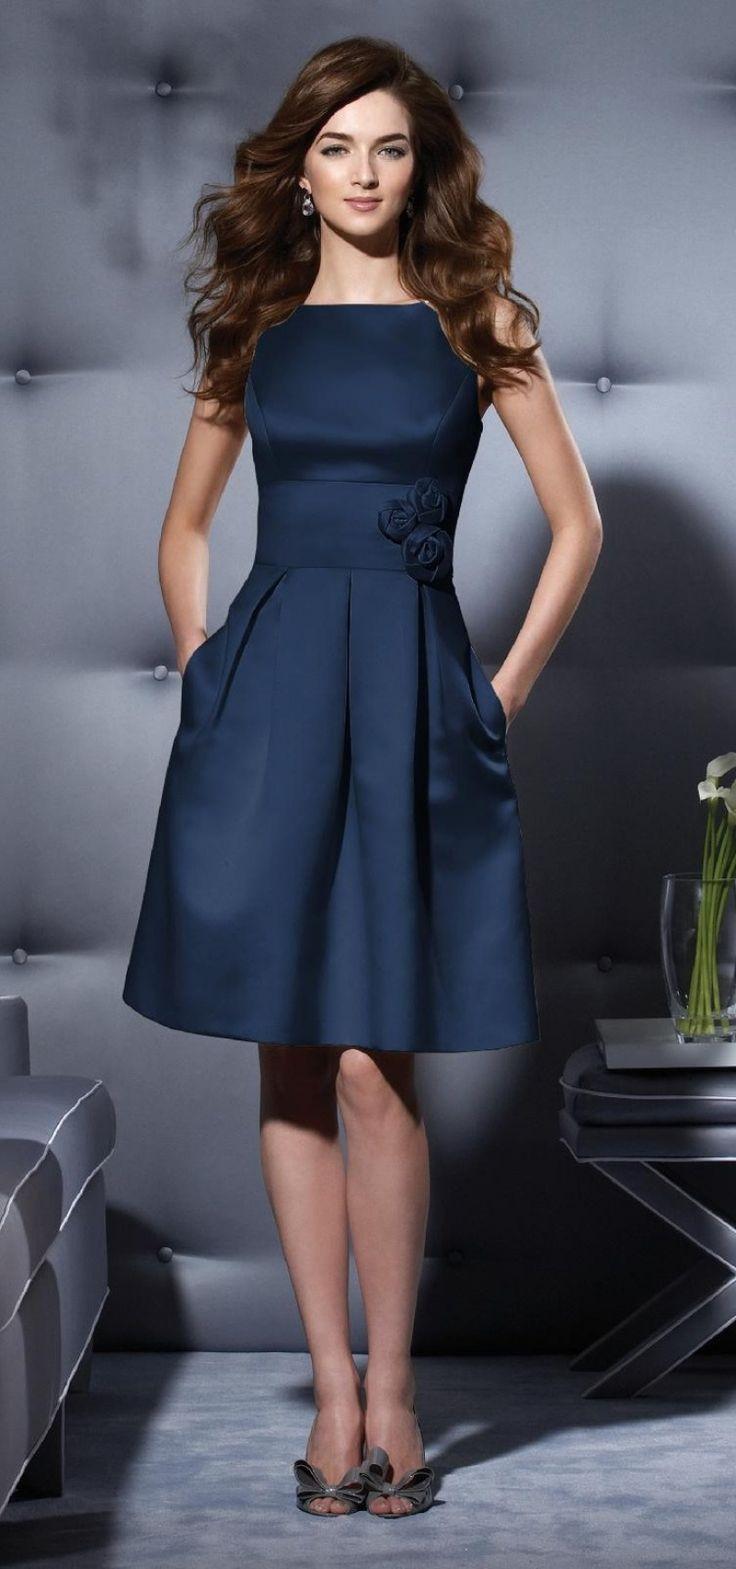 17 Ideas de Vestidos de color Azul que te encantarán ! - Vestidos Mania